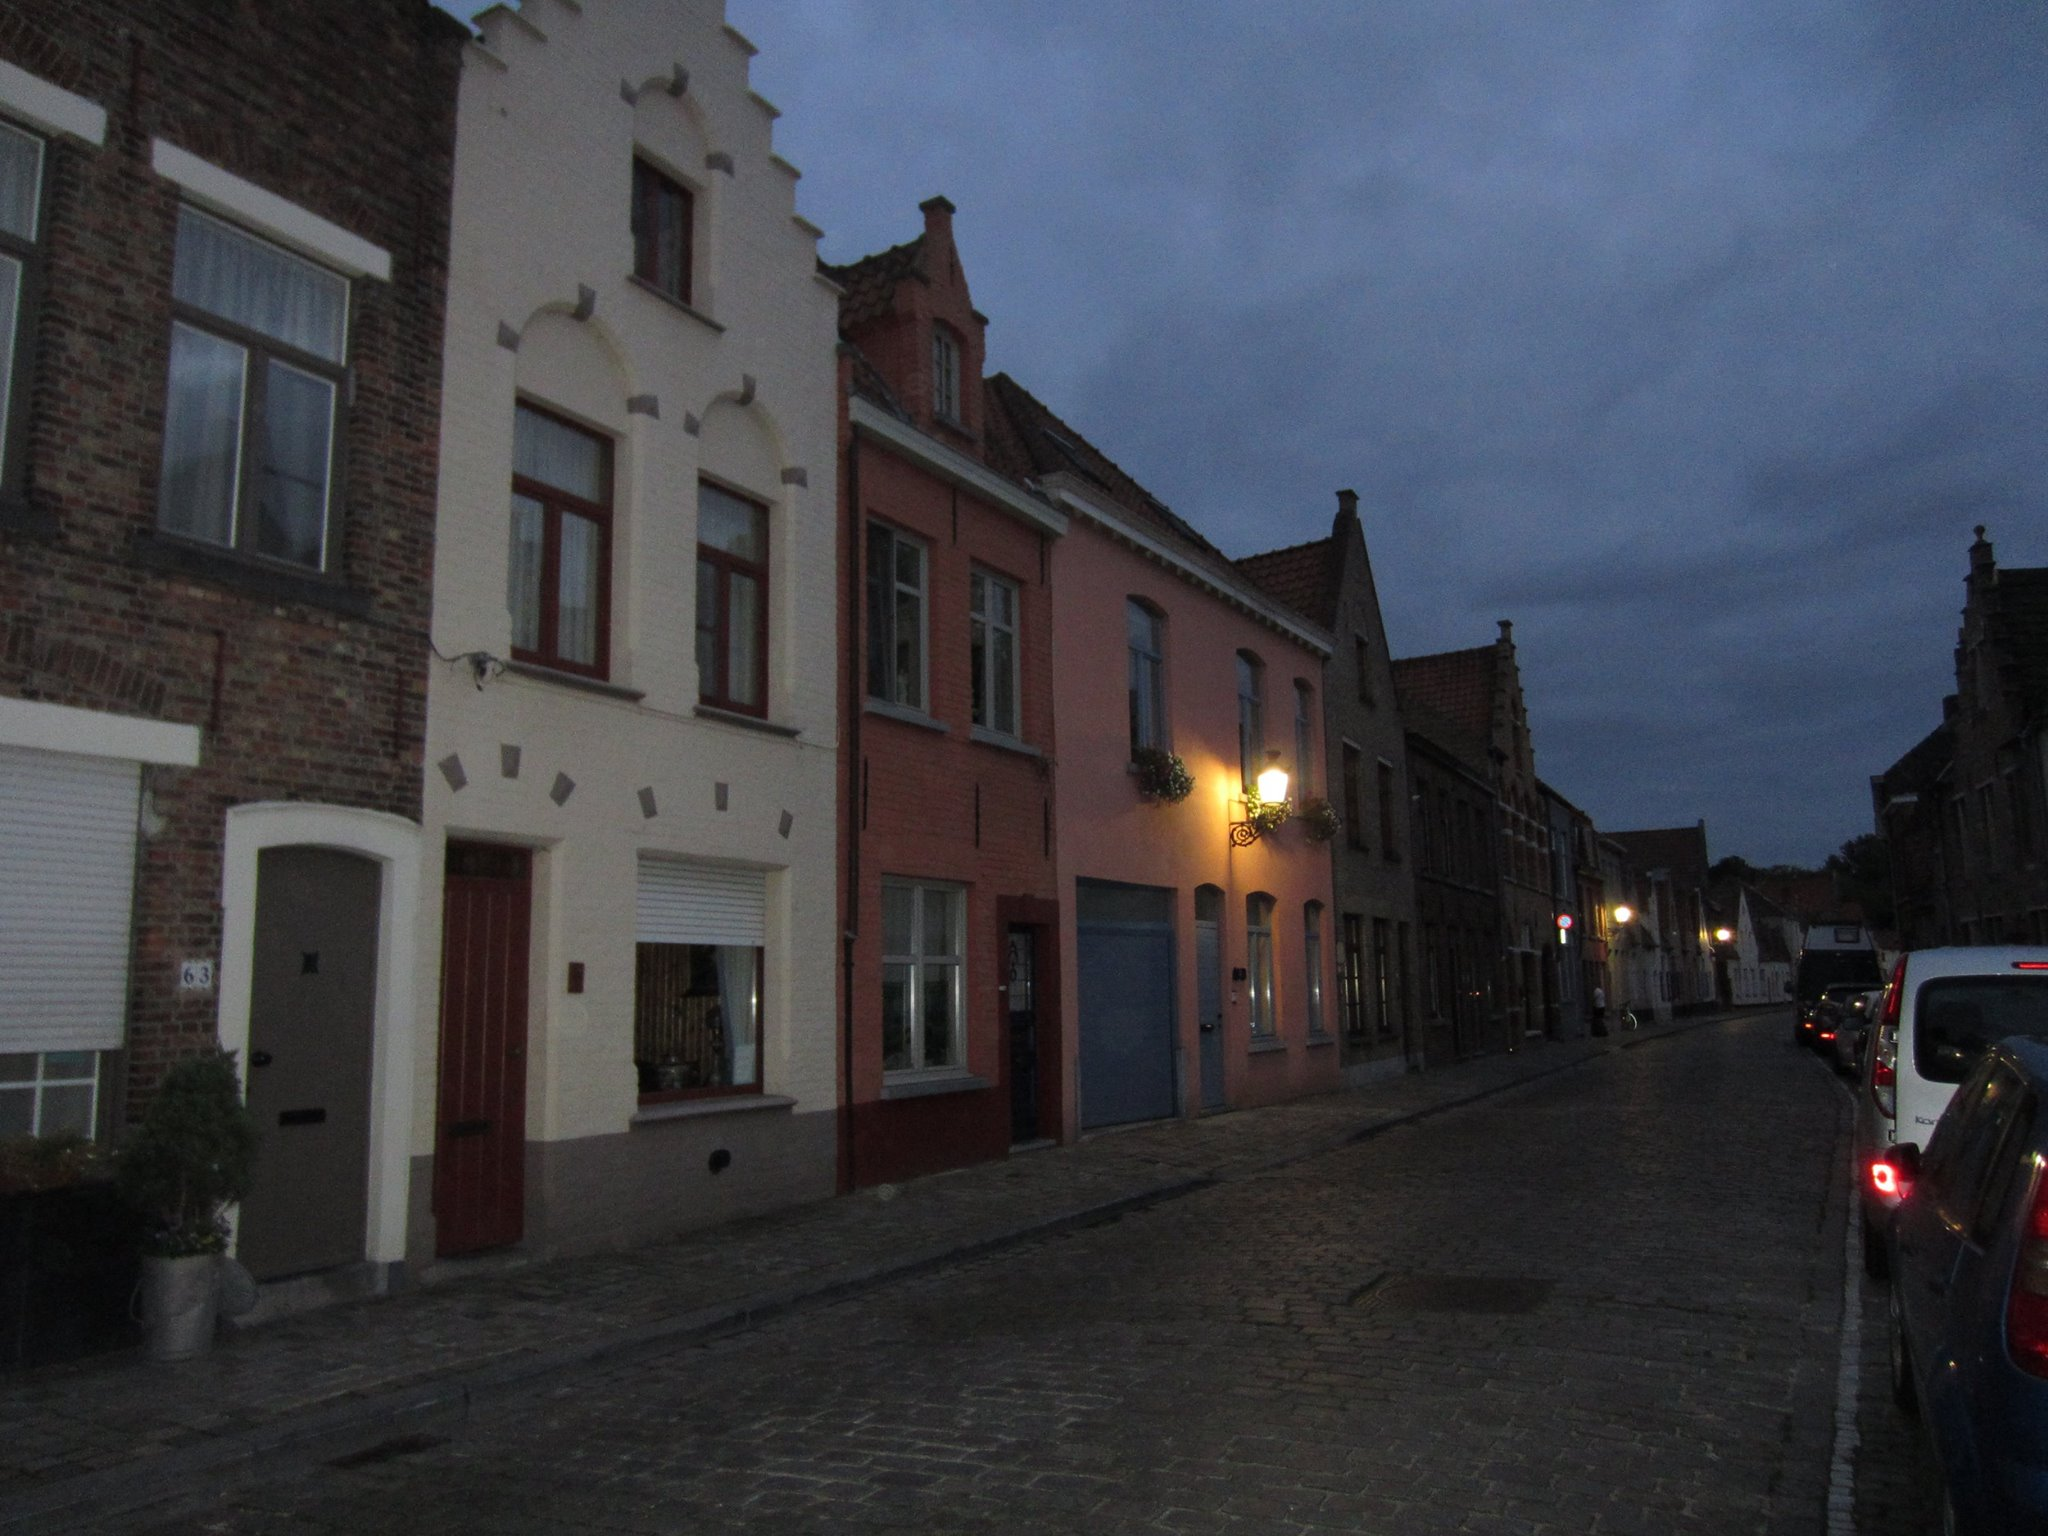 Belgian Farewell Tour - Bruges, Belgium